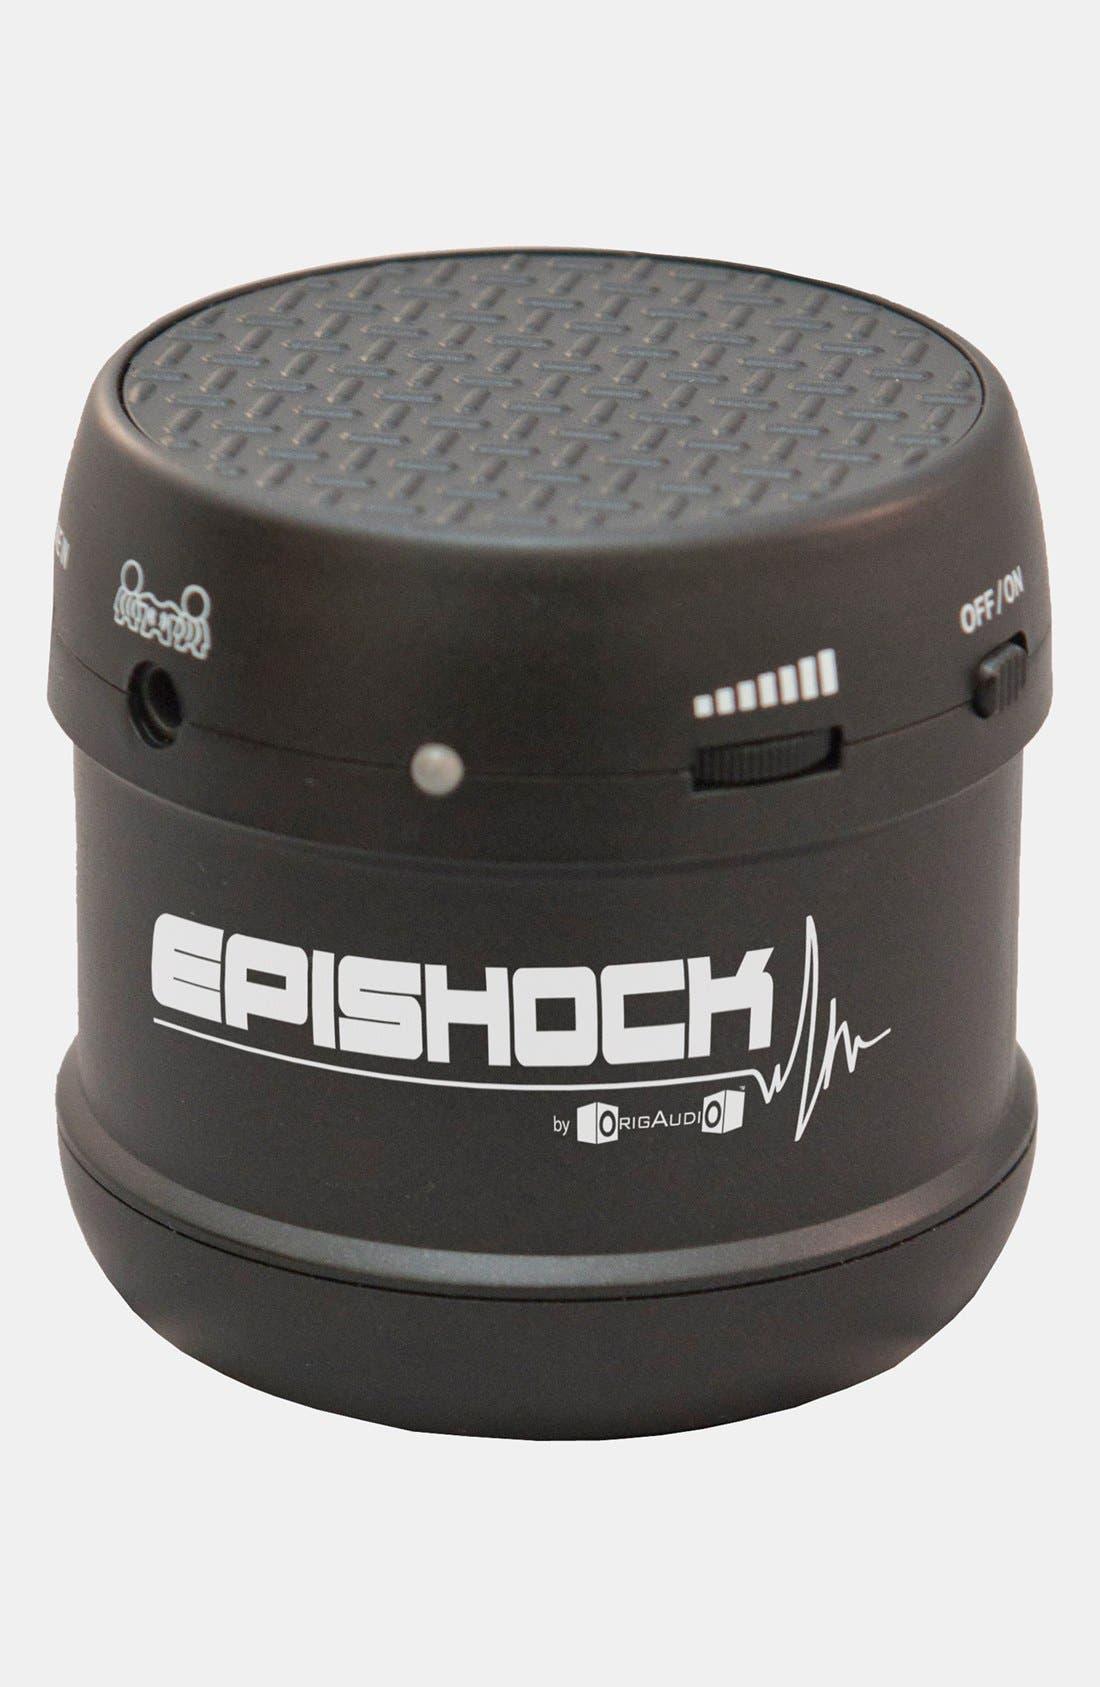 Alternate Image 1 Selected - 'Epishock' Portable Surface Vibration Speaker